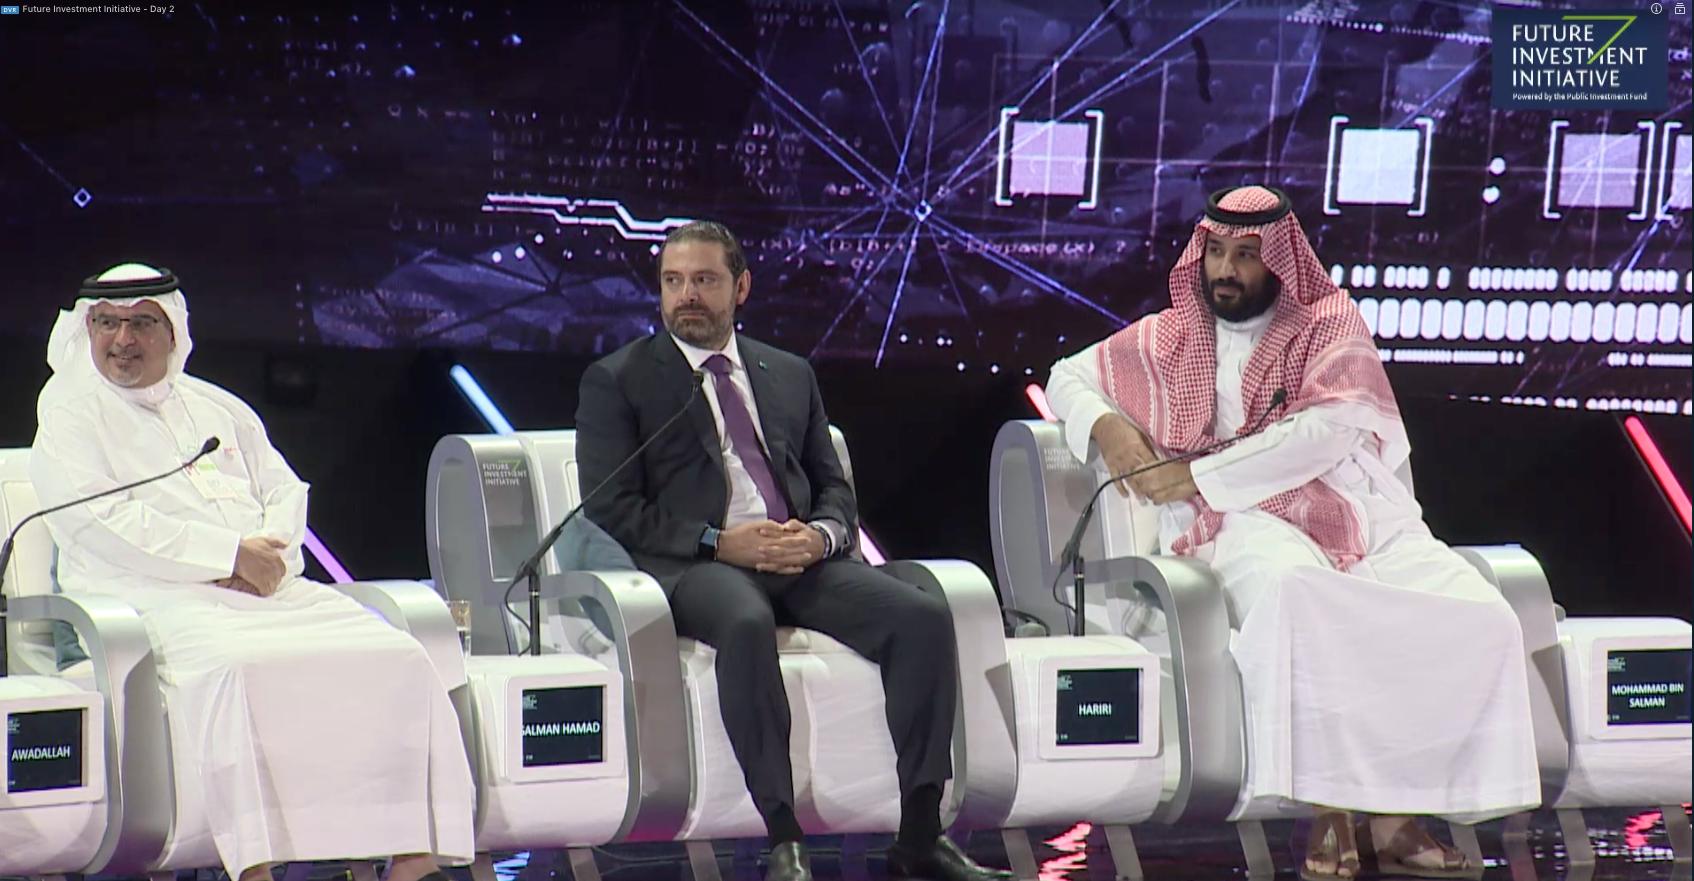 Lebanese PM Hariri and Saudi Crown Prince Mohammed bin Salman share the stage in Riyadh on Wednesday.